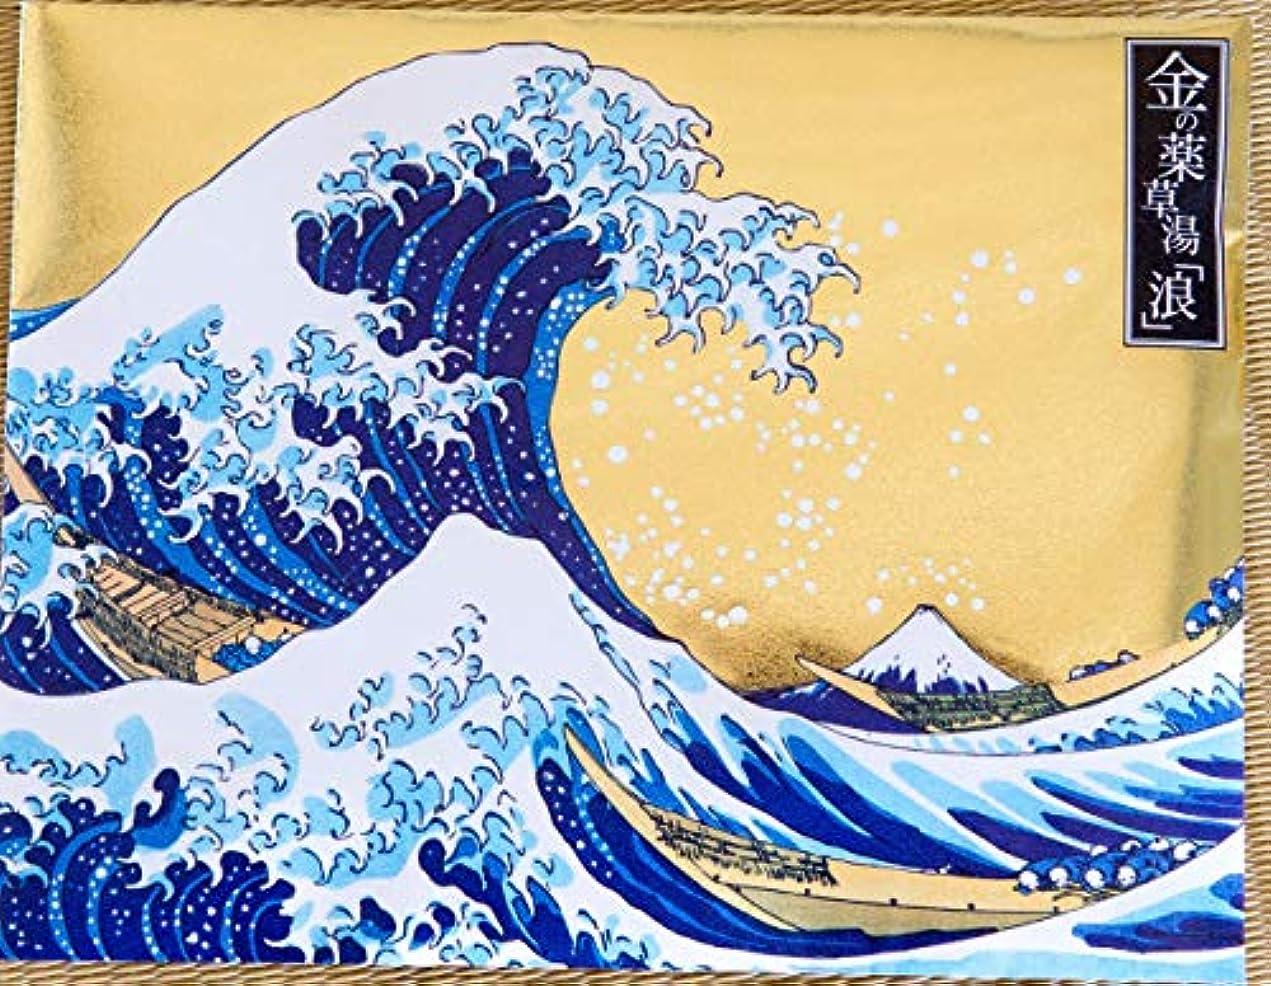 不毛の間接的記述する金の薬草湯「浪」 神奈川沖浪裏(富嶽三十六景)